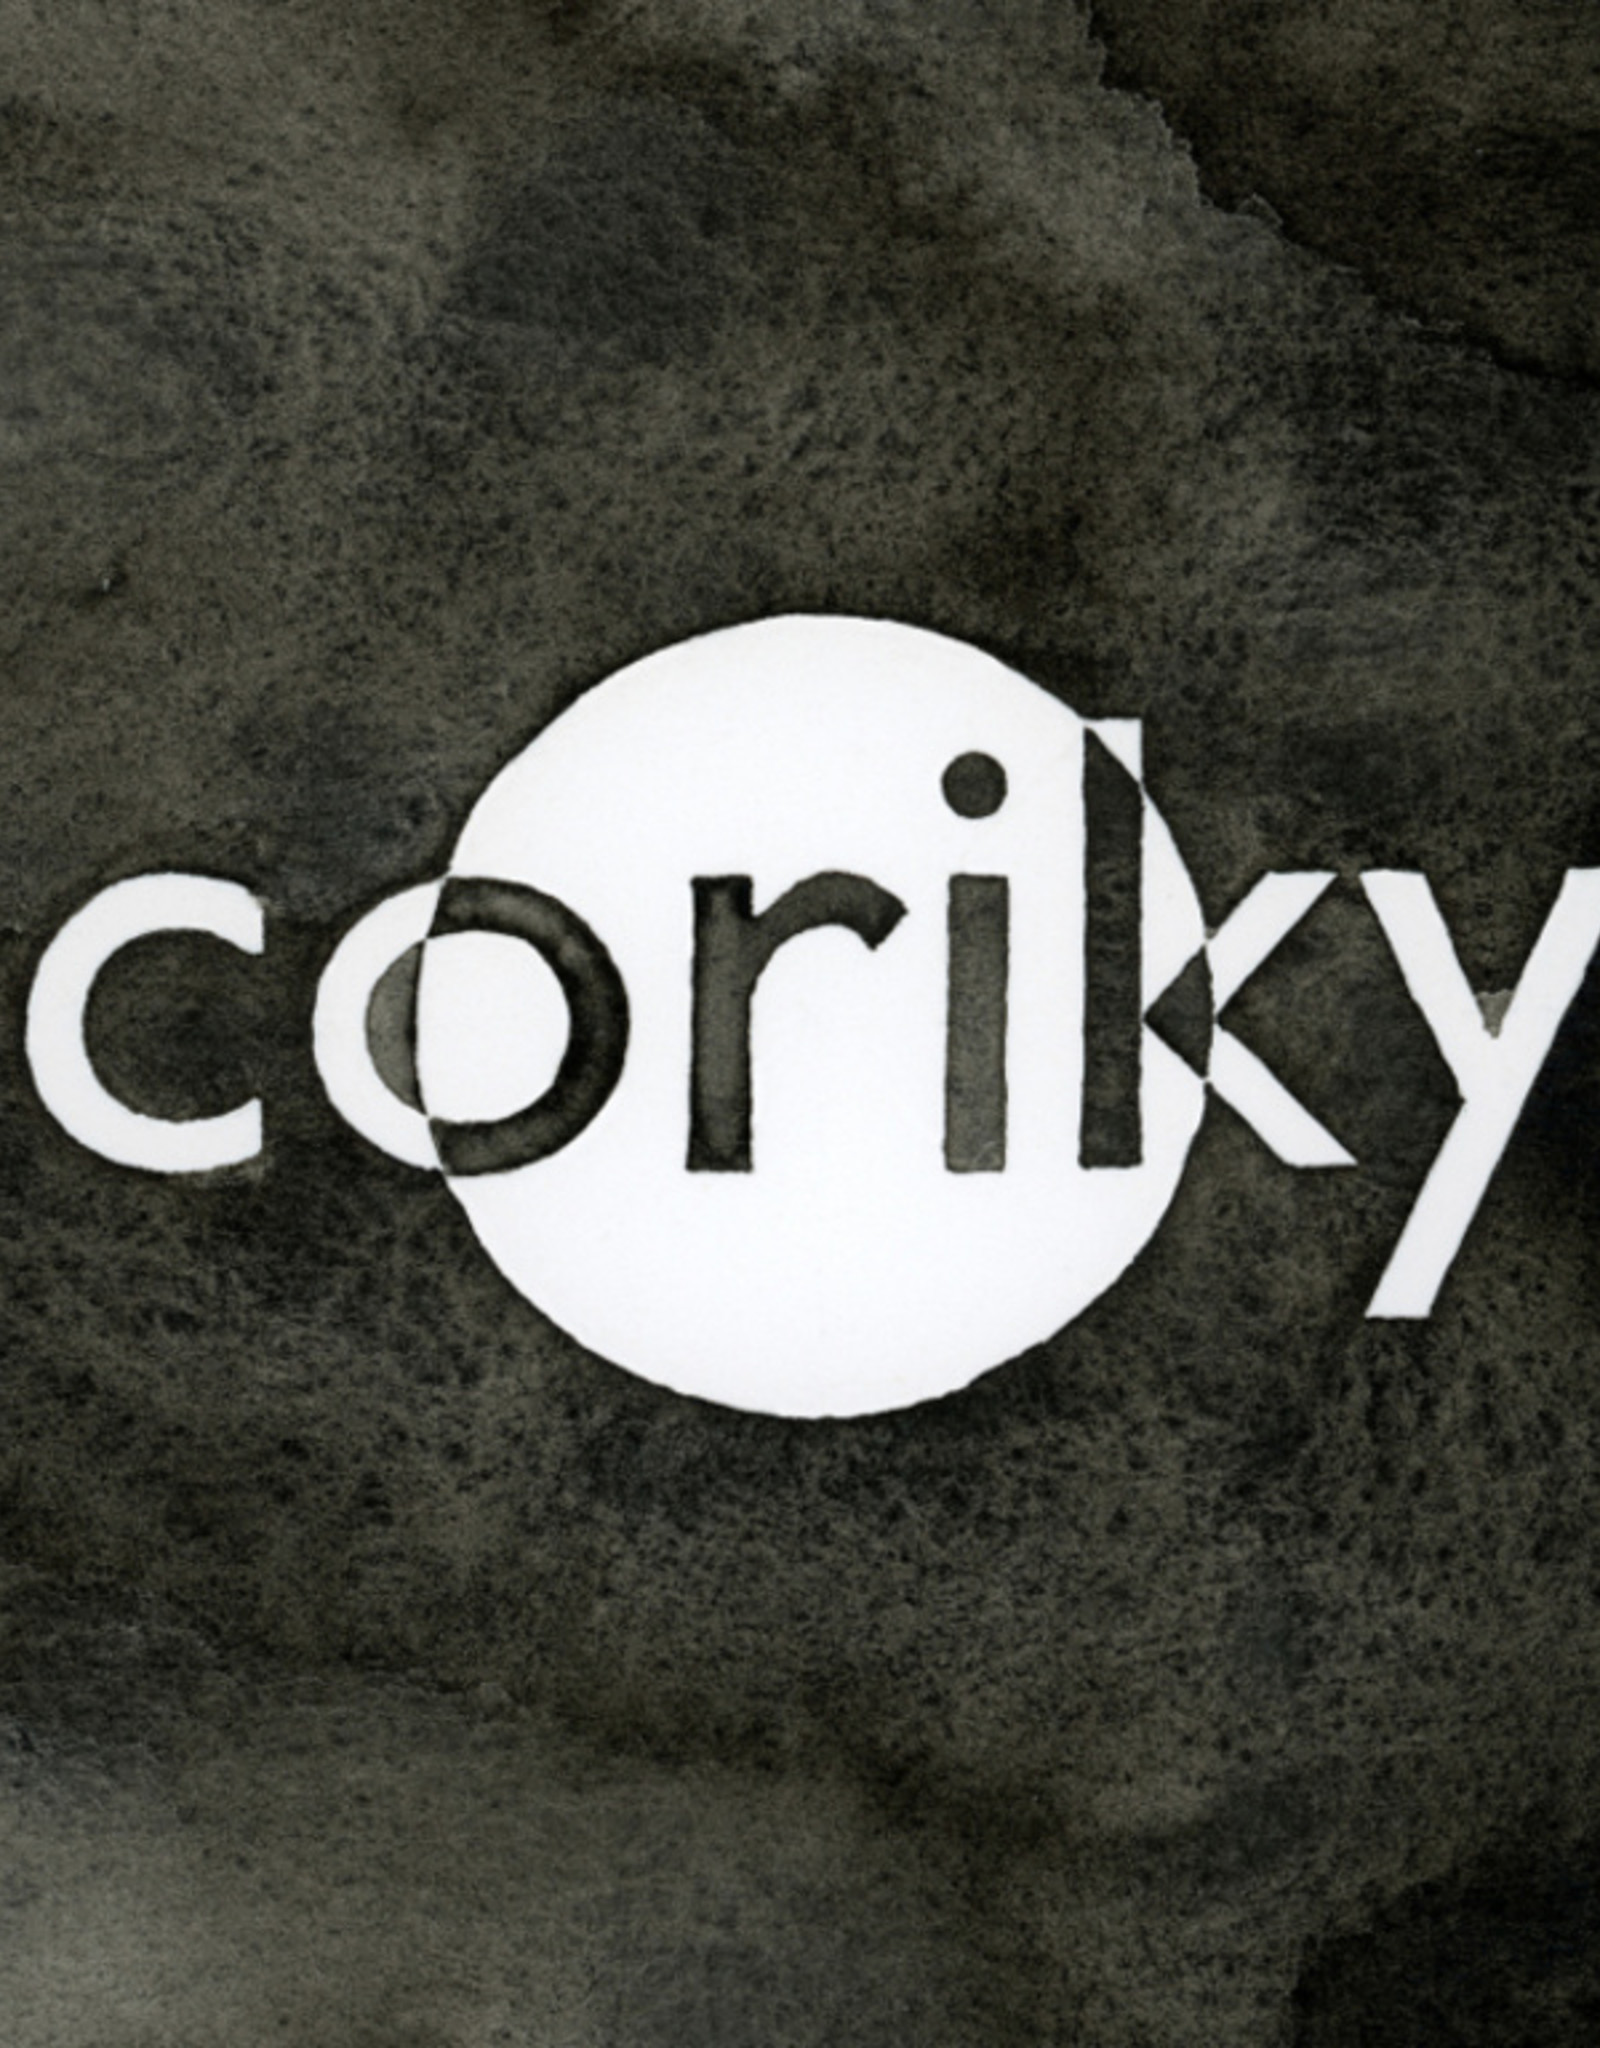 Coricky - S/T